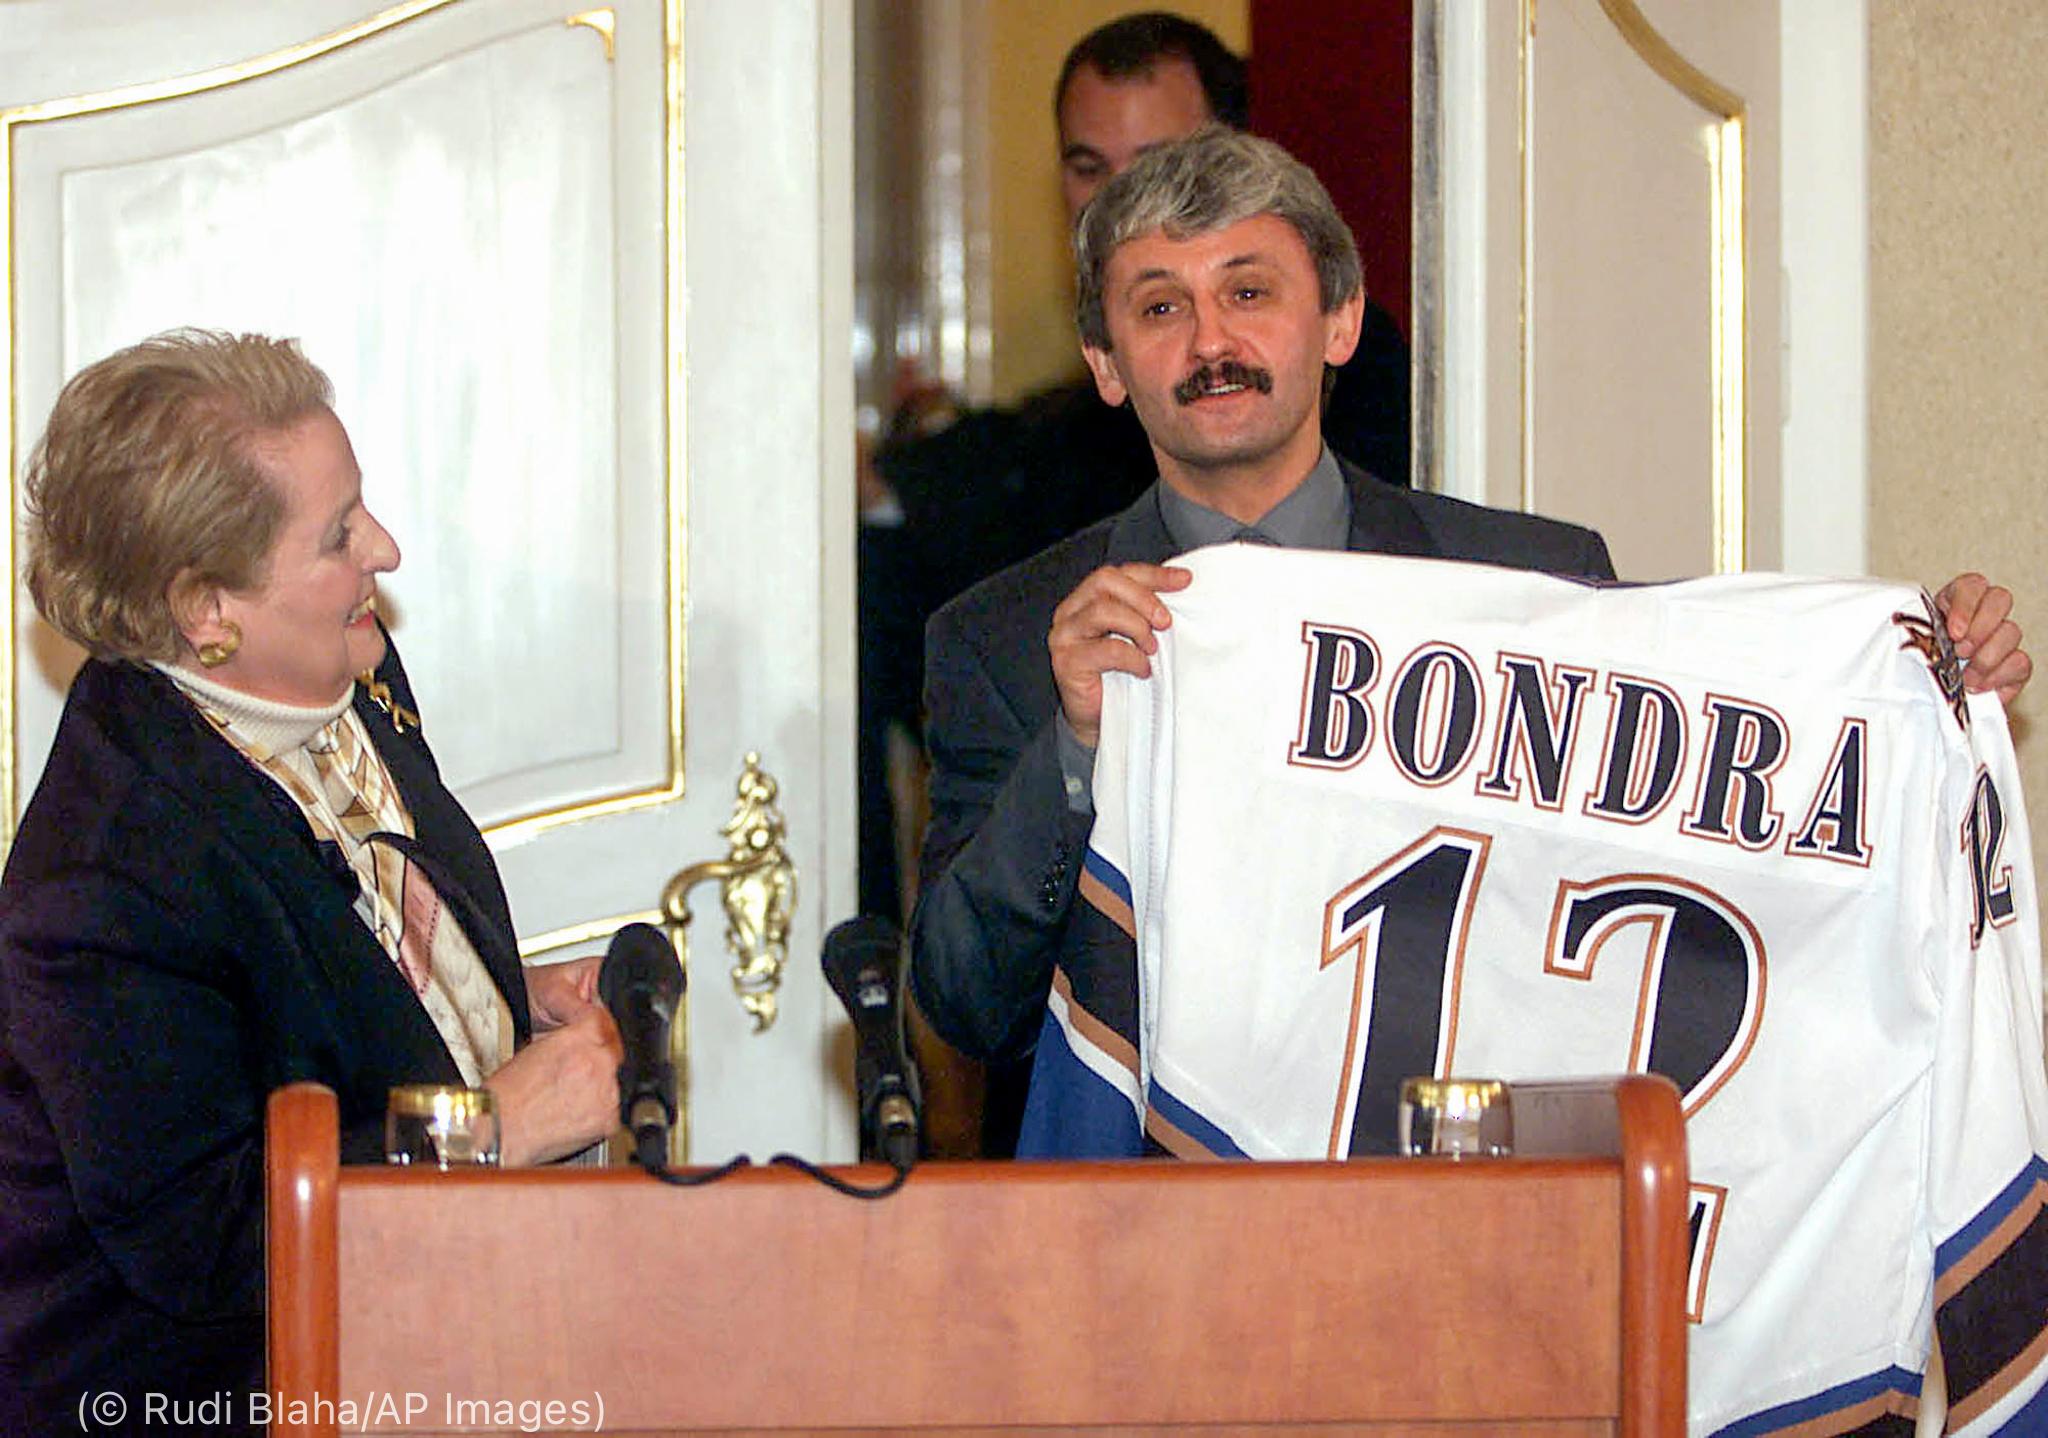 Madeleine Albright looking at Mikuláš Dzurinda holding up hockey jersey (© Rudi Blaha/AP Images)